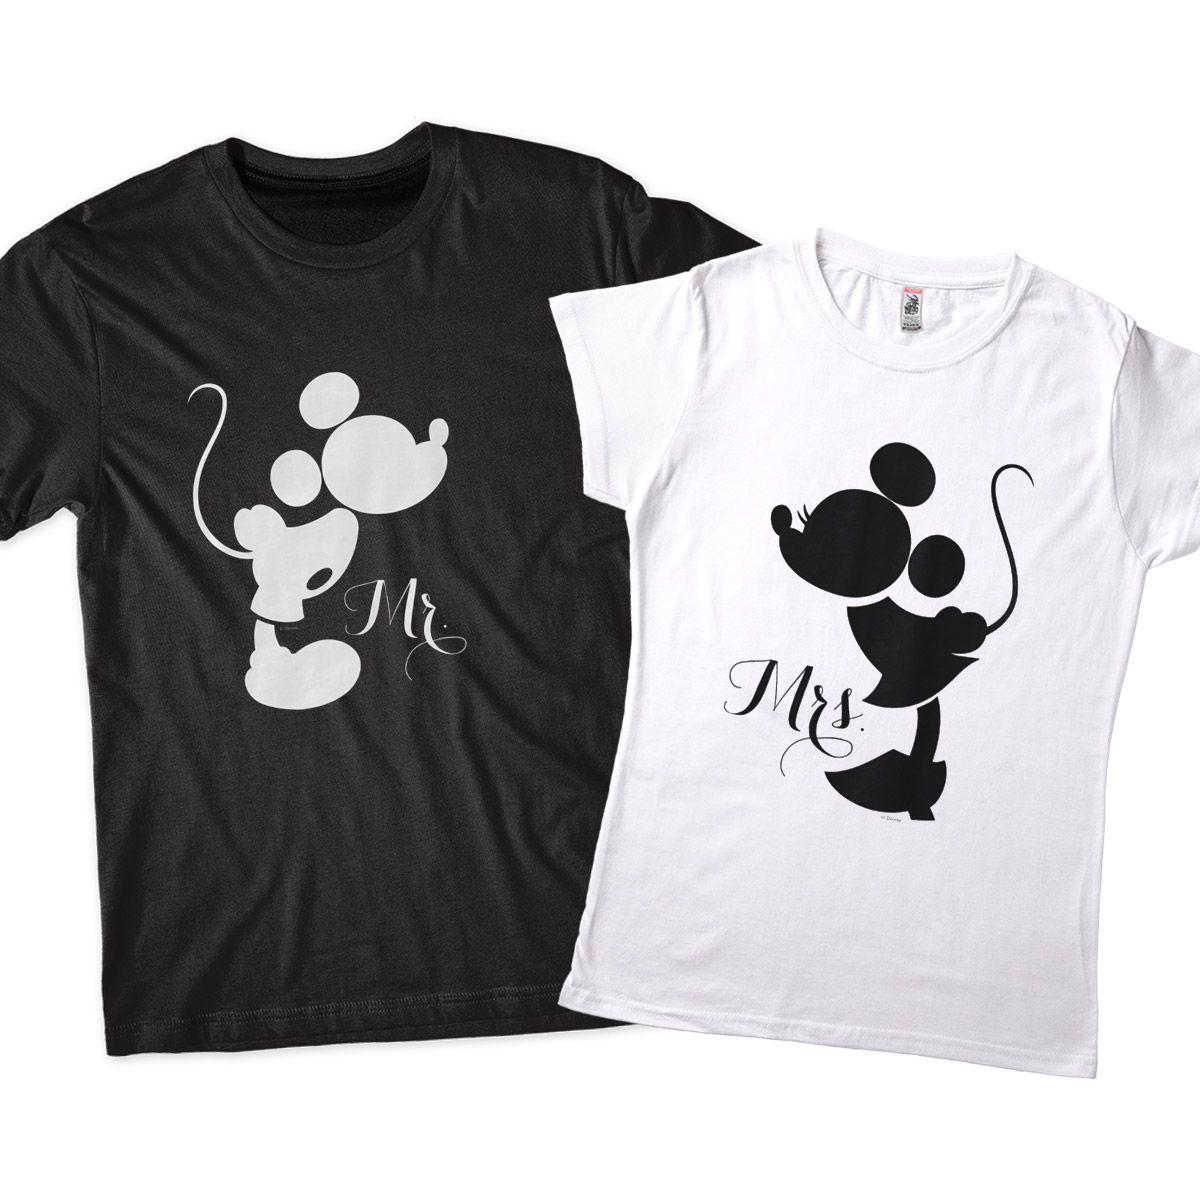 KIT 2 camisetas encontro de casal tamanho M